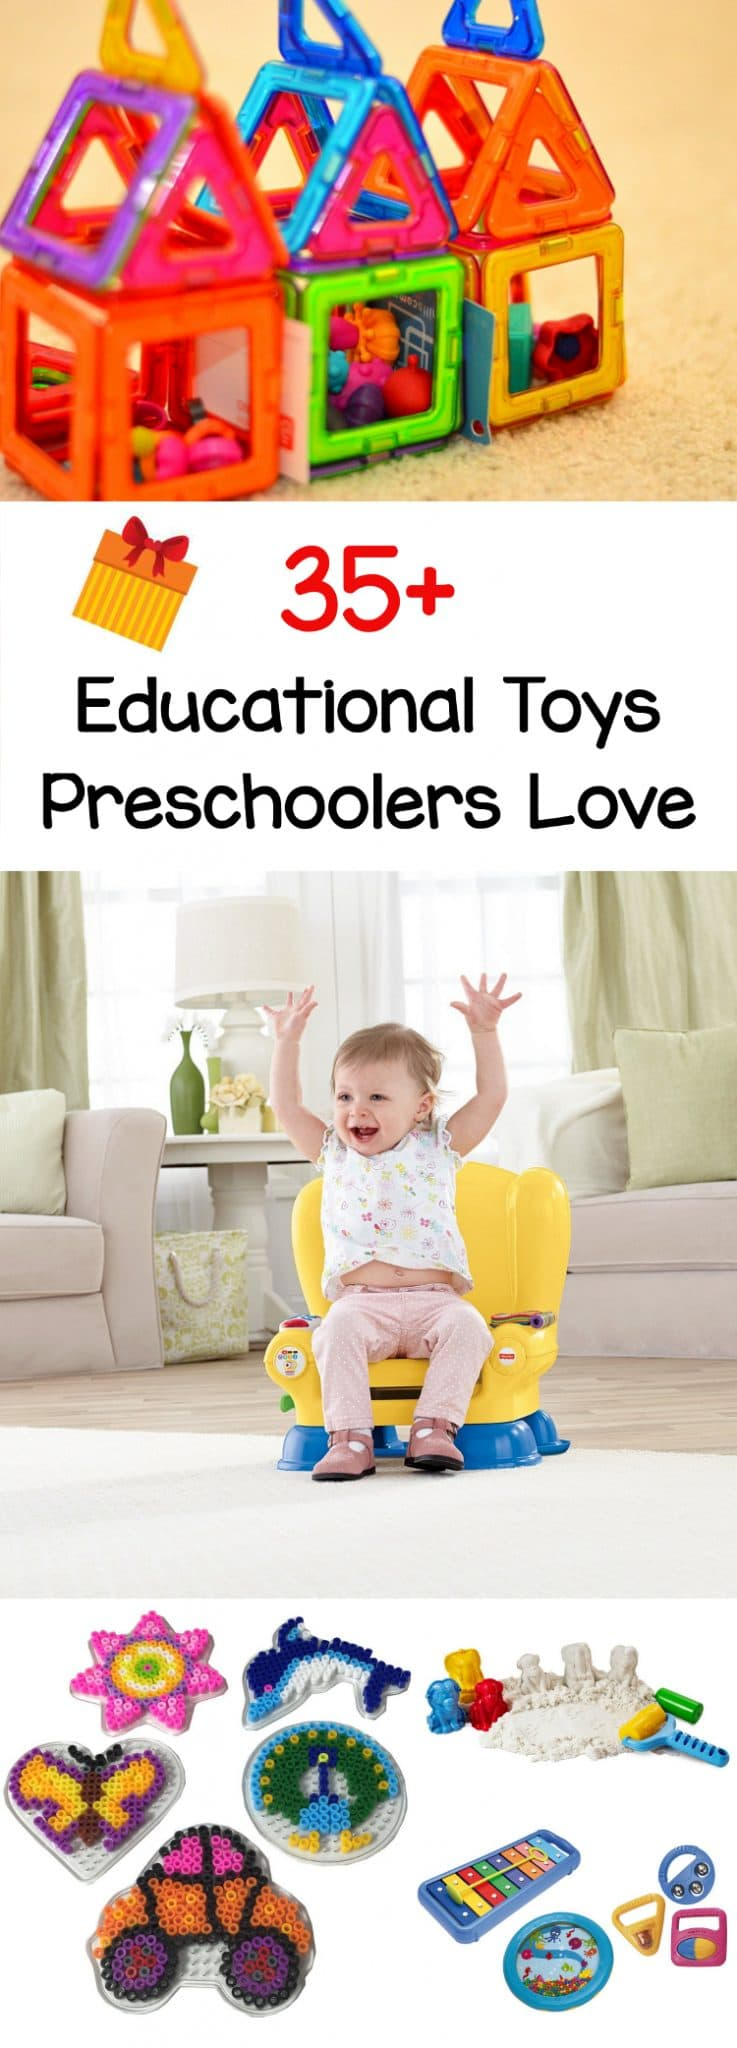 Gift Ideas - 35+ Educational Toys Preschoolers Love